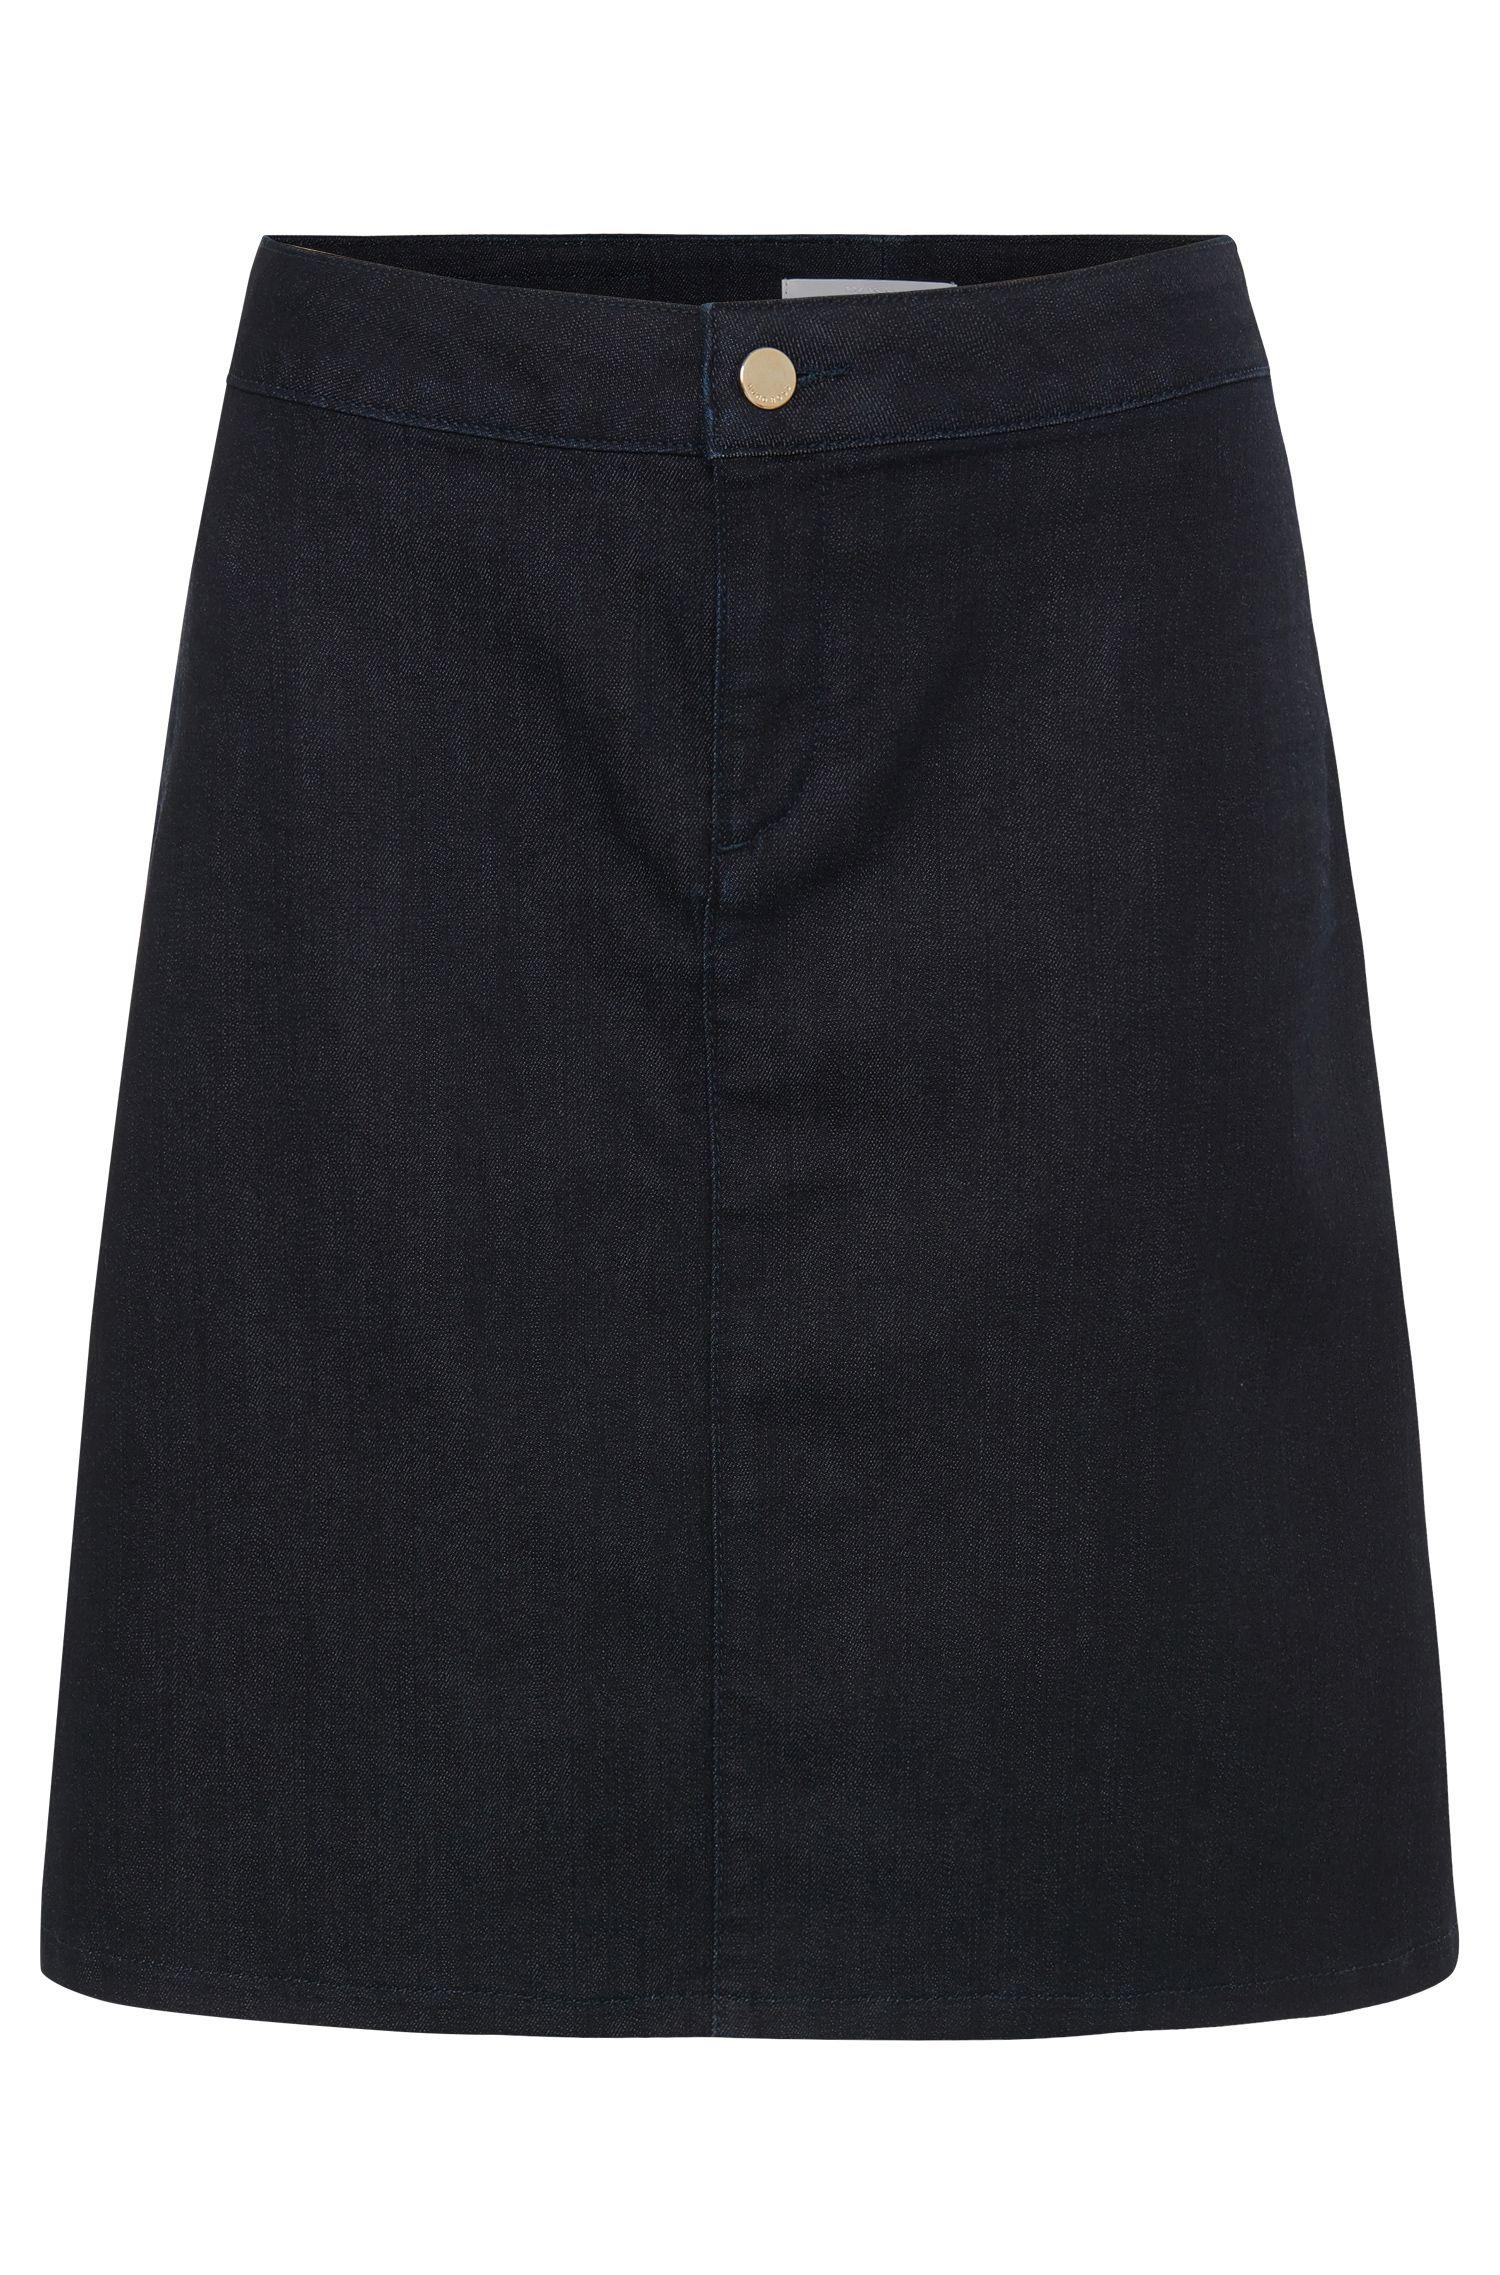 Denim skirt in stretchy cotton blend: 'Noyah SLOW'